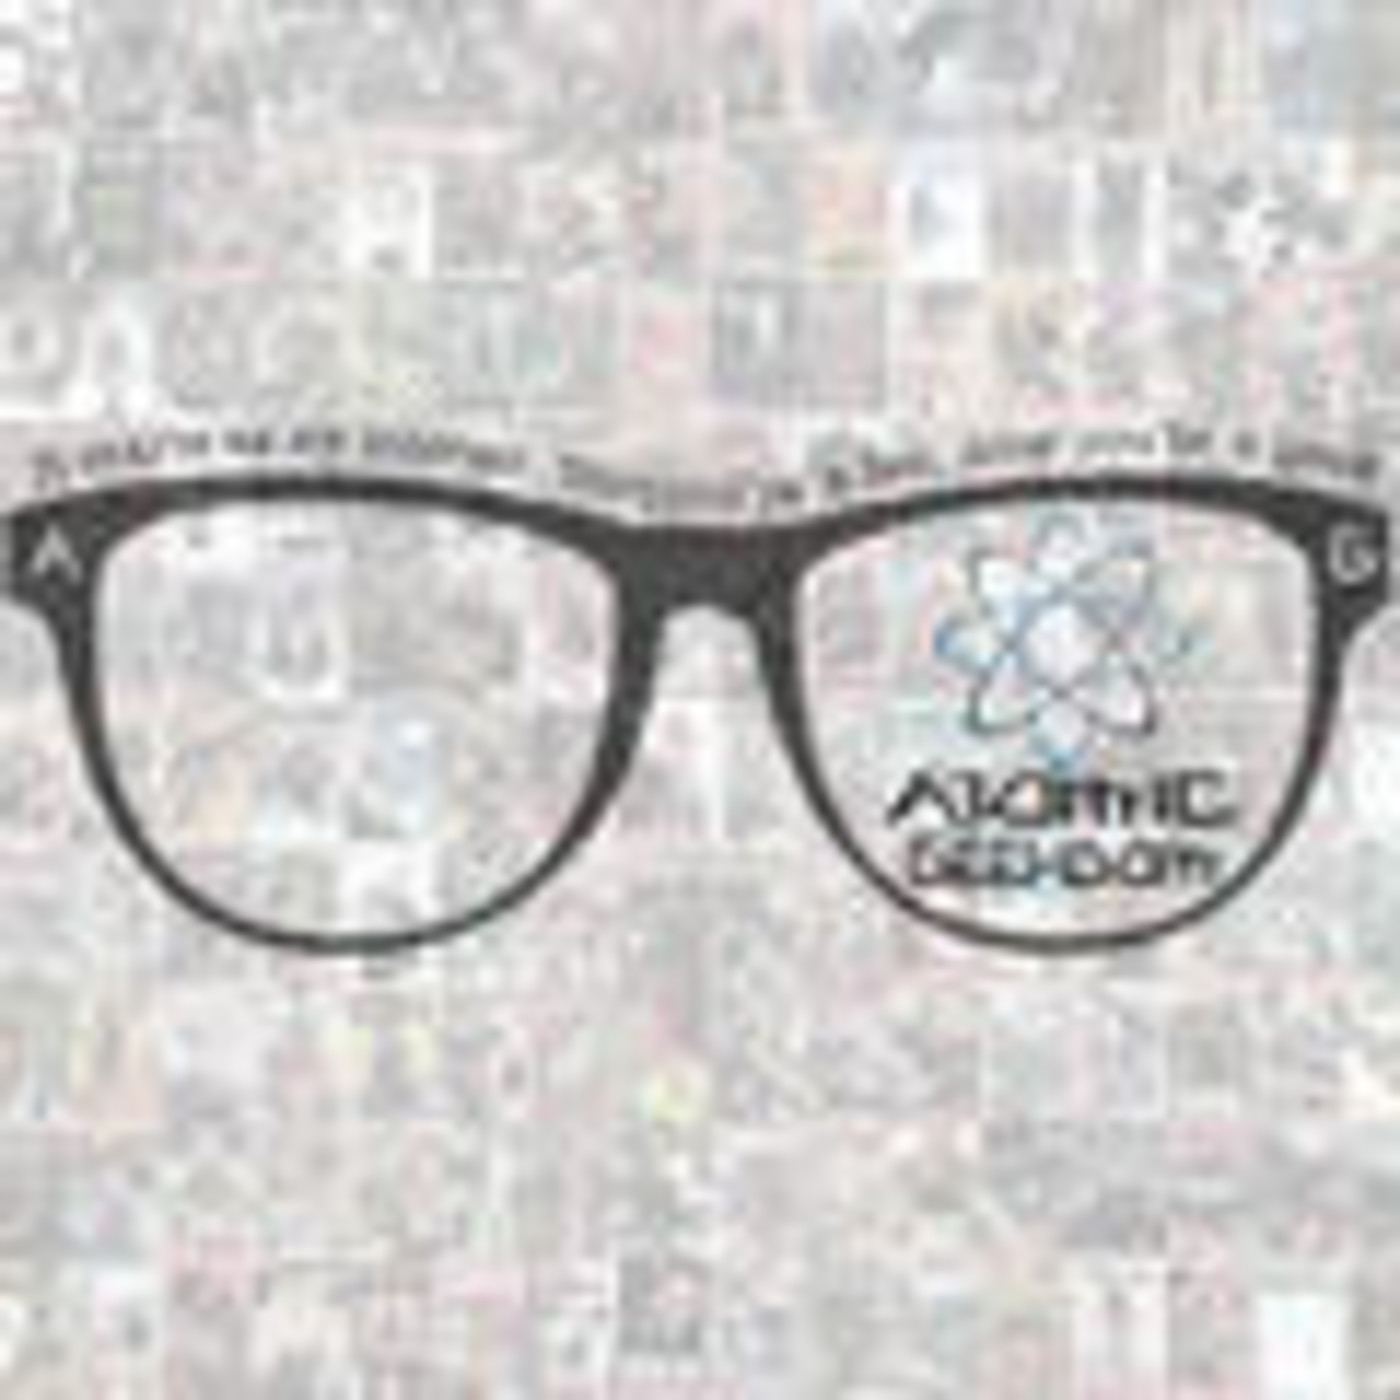 Atomic Geekdom